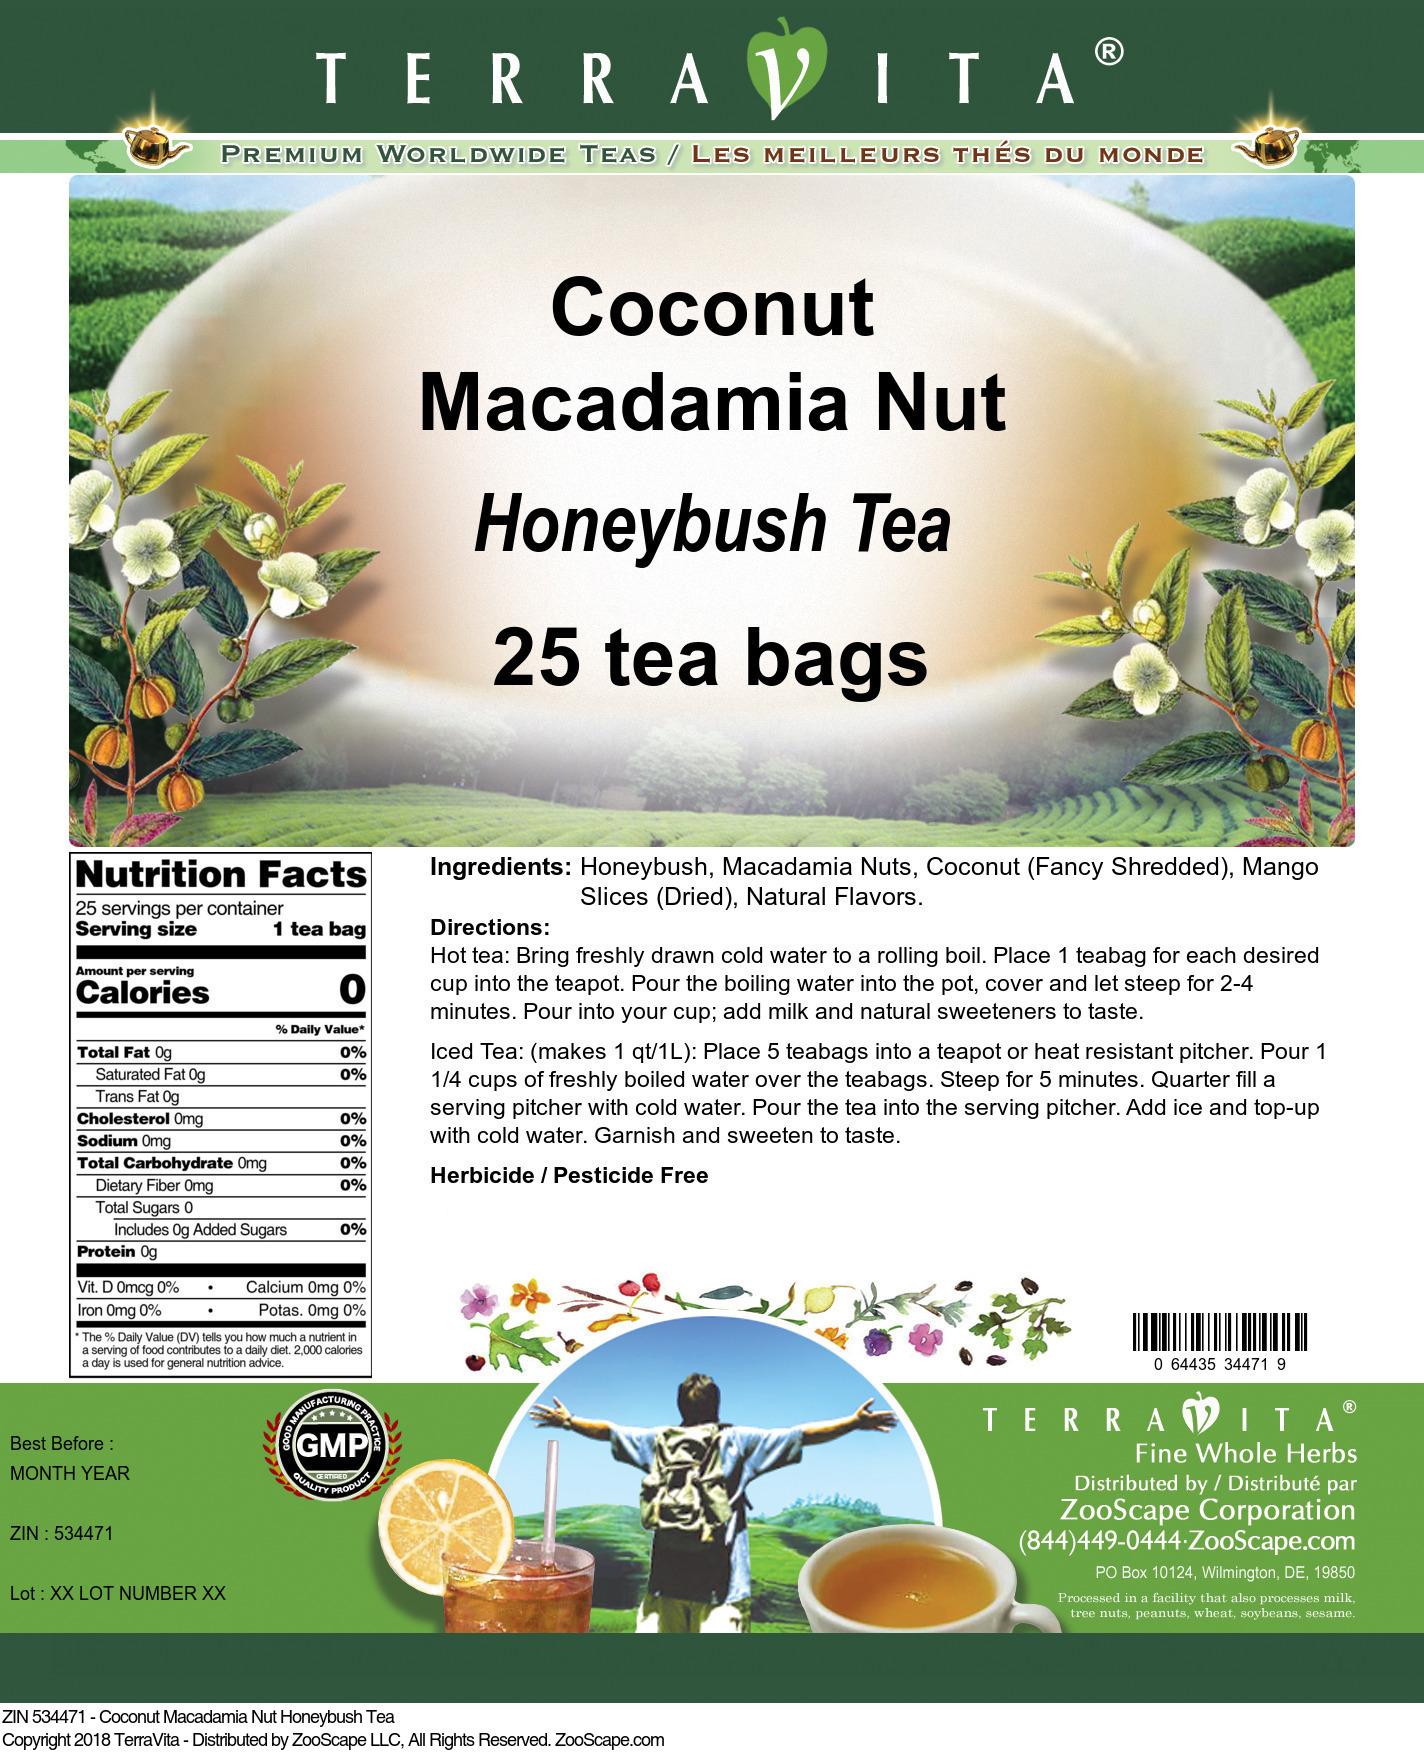 Coconut Macadamia Nut Honeybush Tea